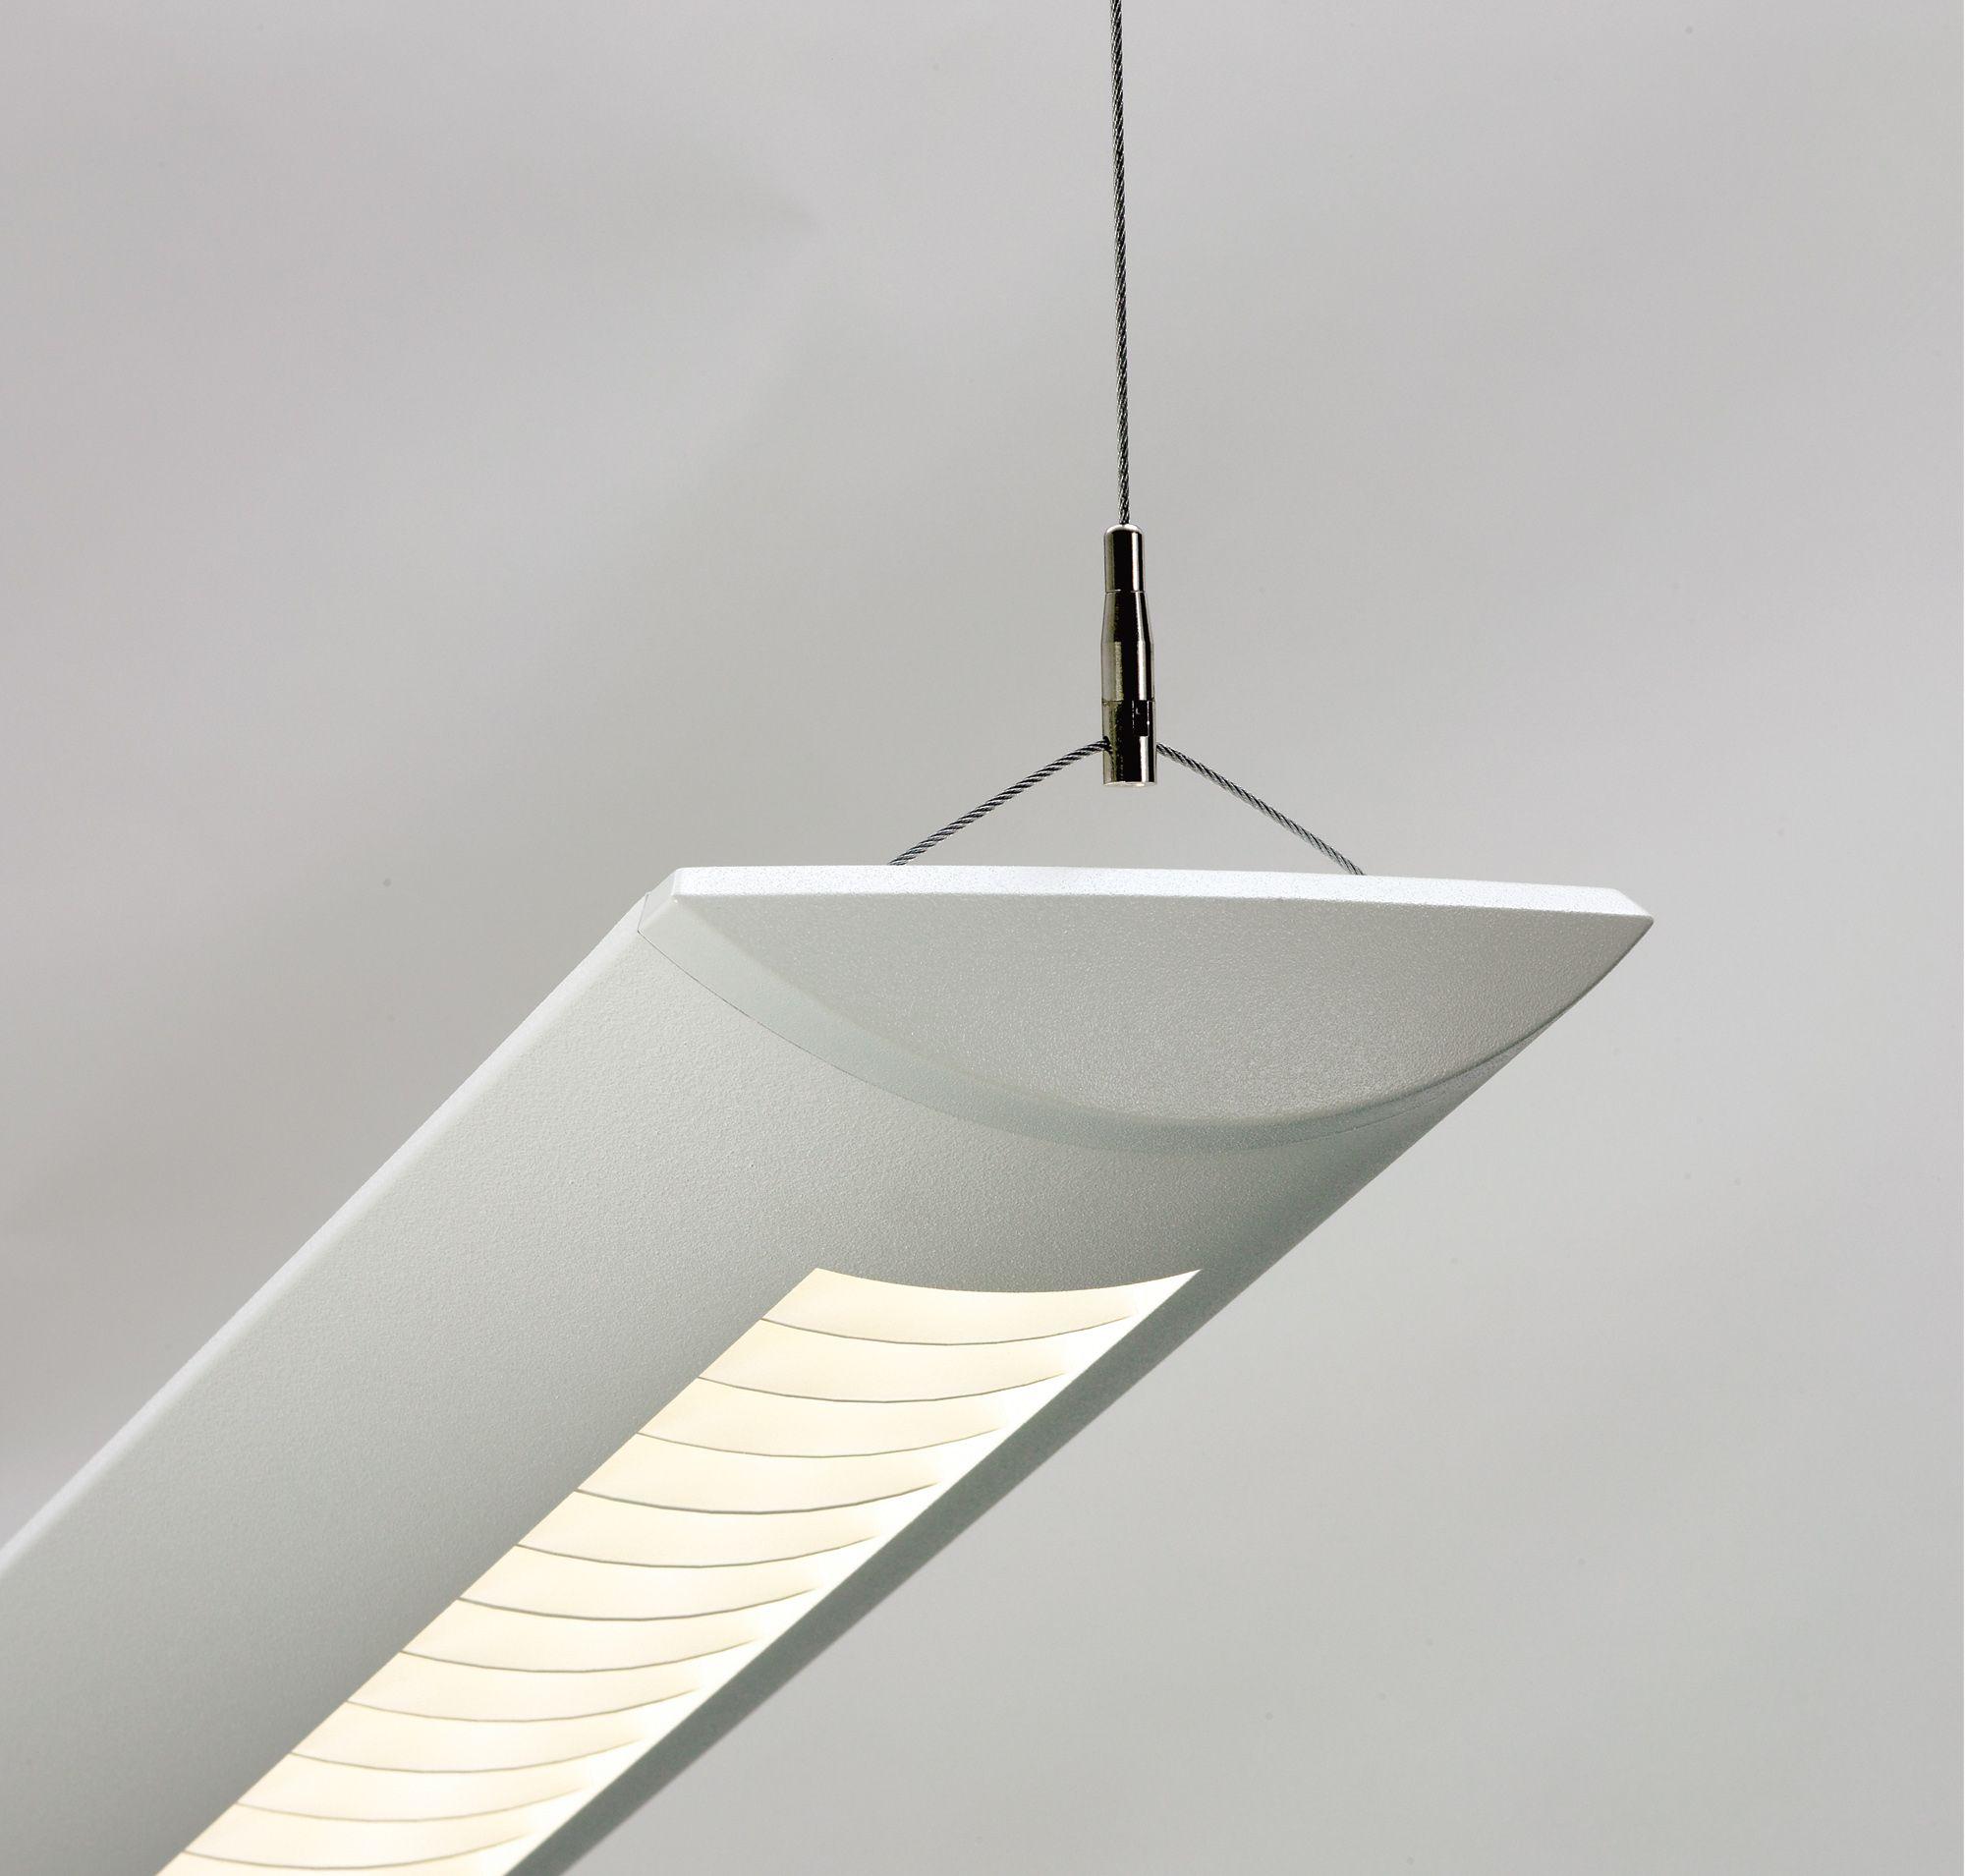 Litecontrol Arcos Indirectdirect Suspended Linear Fluorescent Pendant